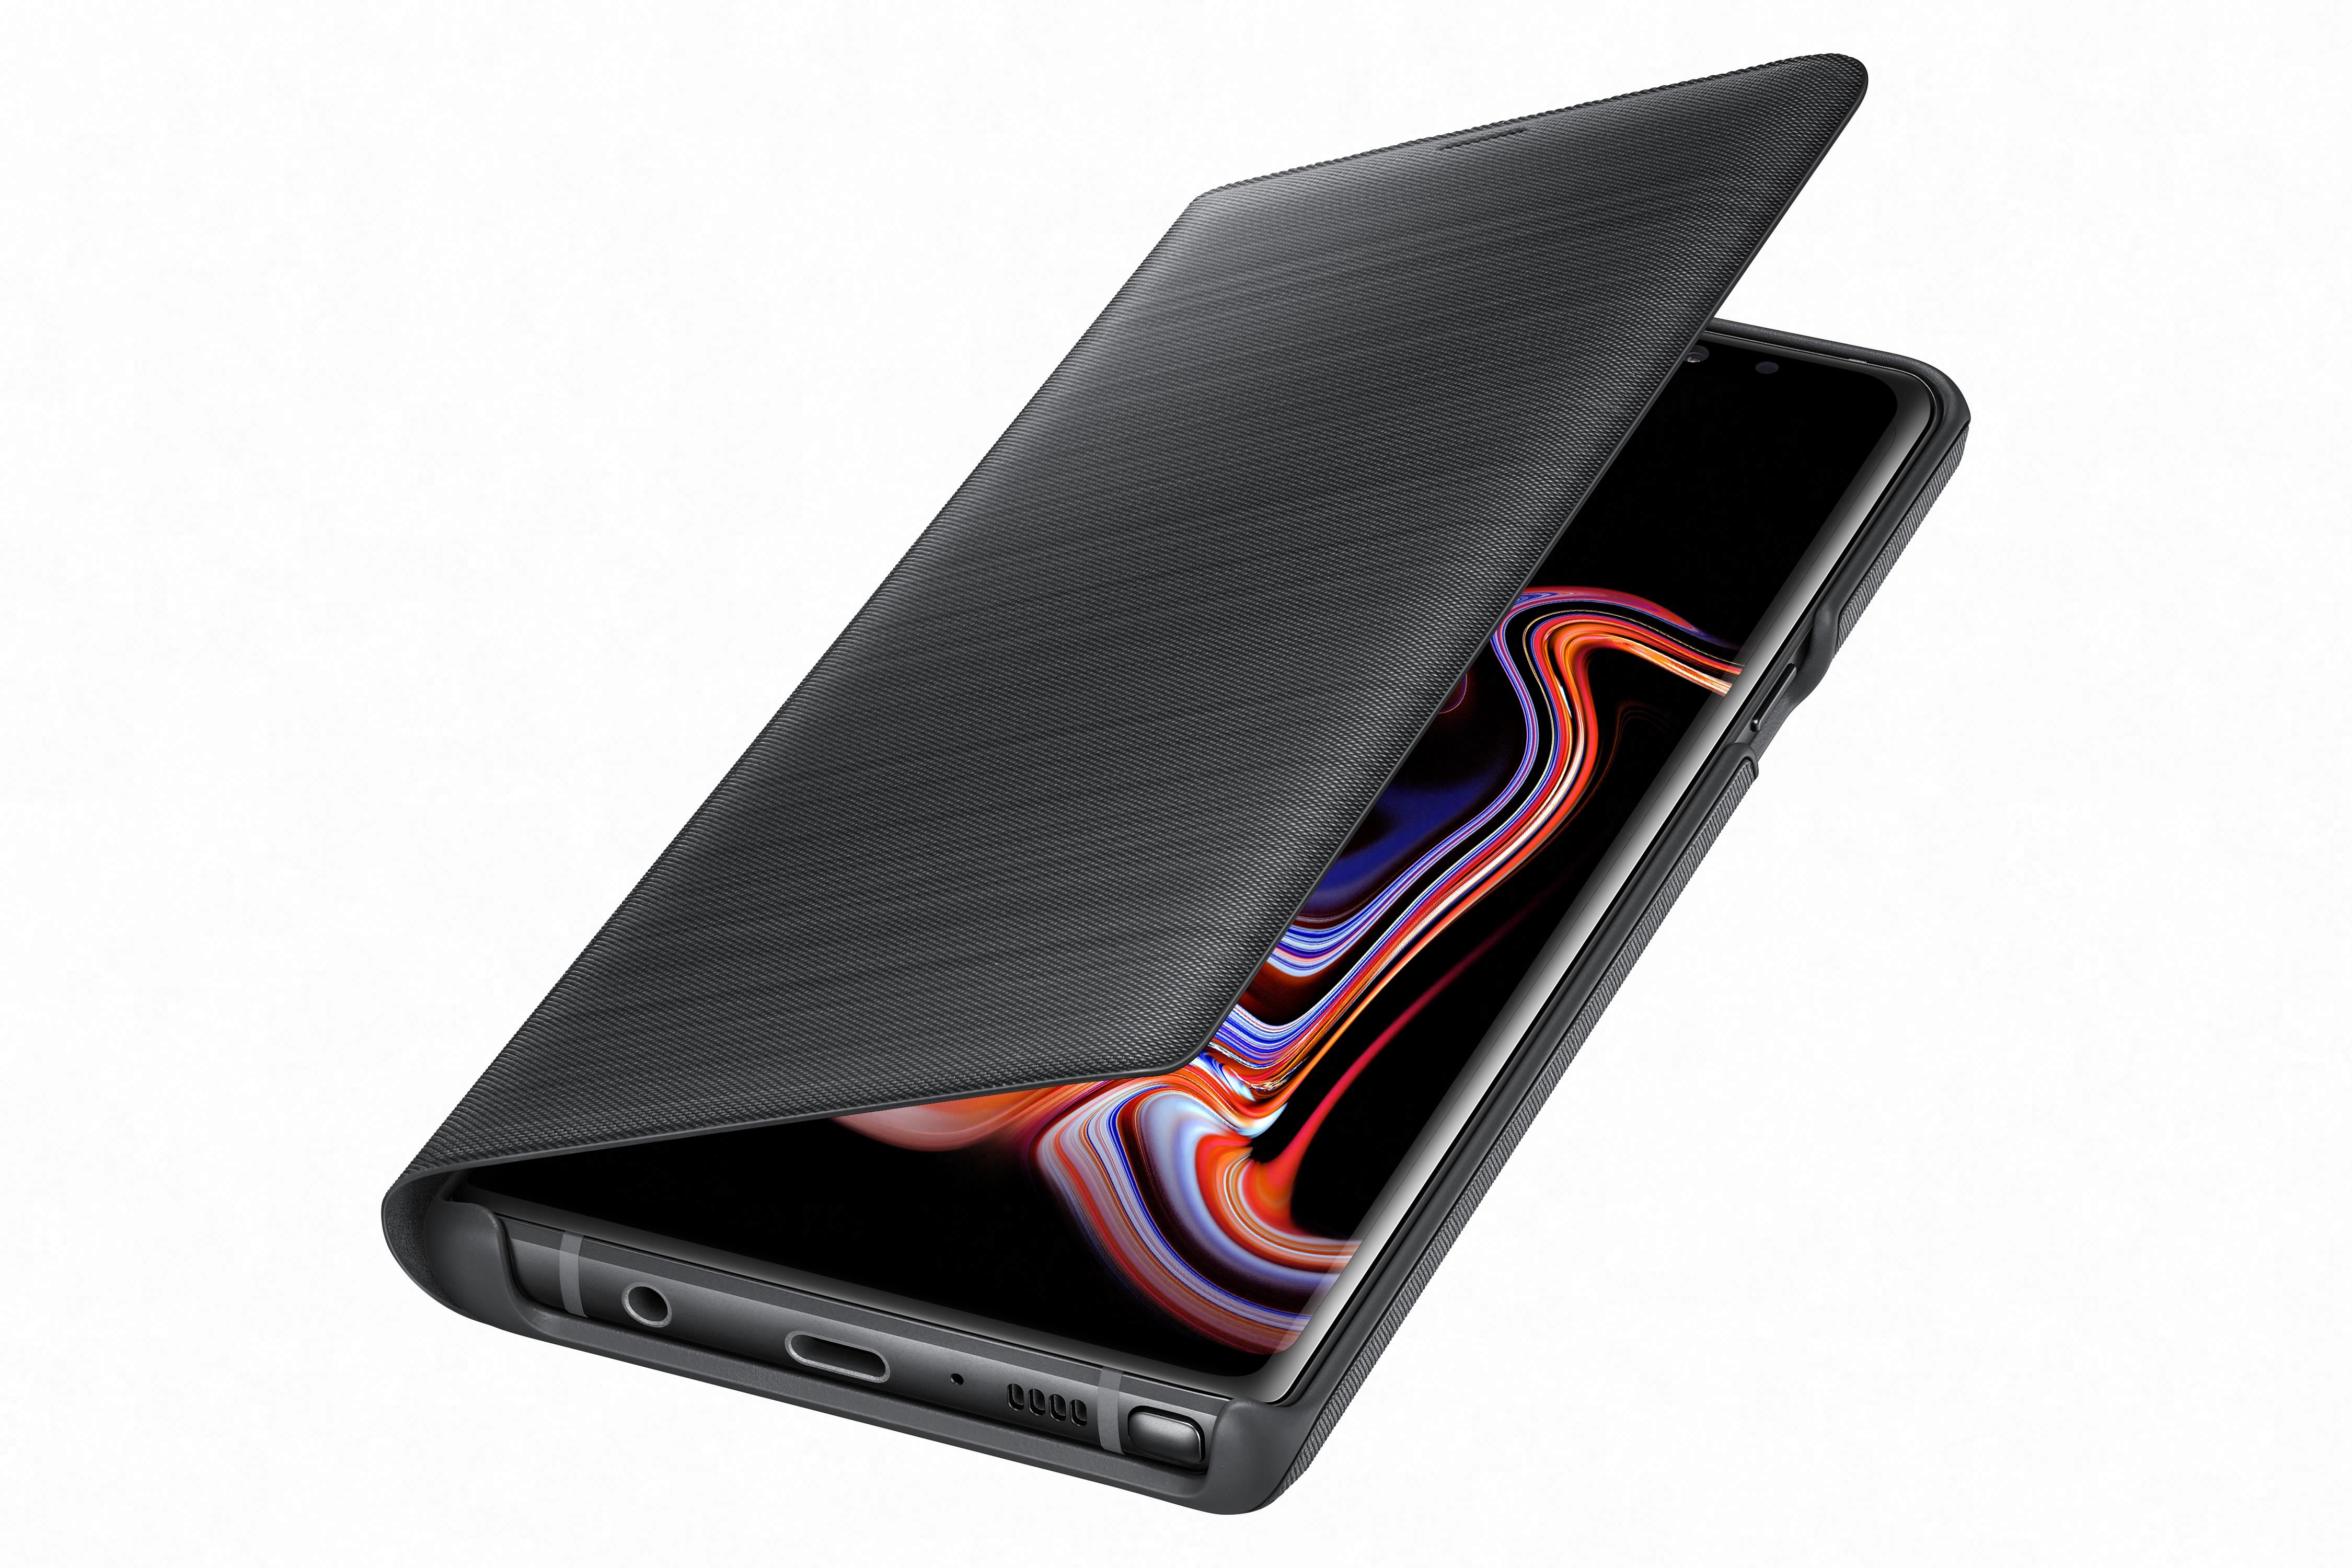 Etui Led View Galaxy Note9 noir